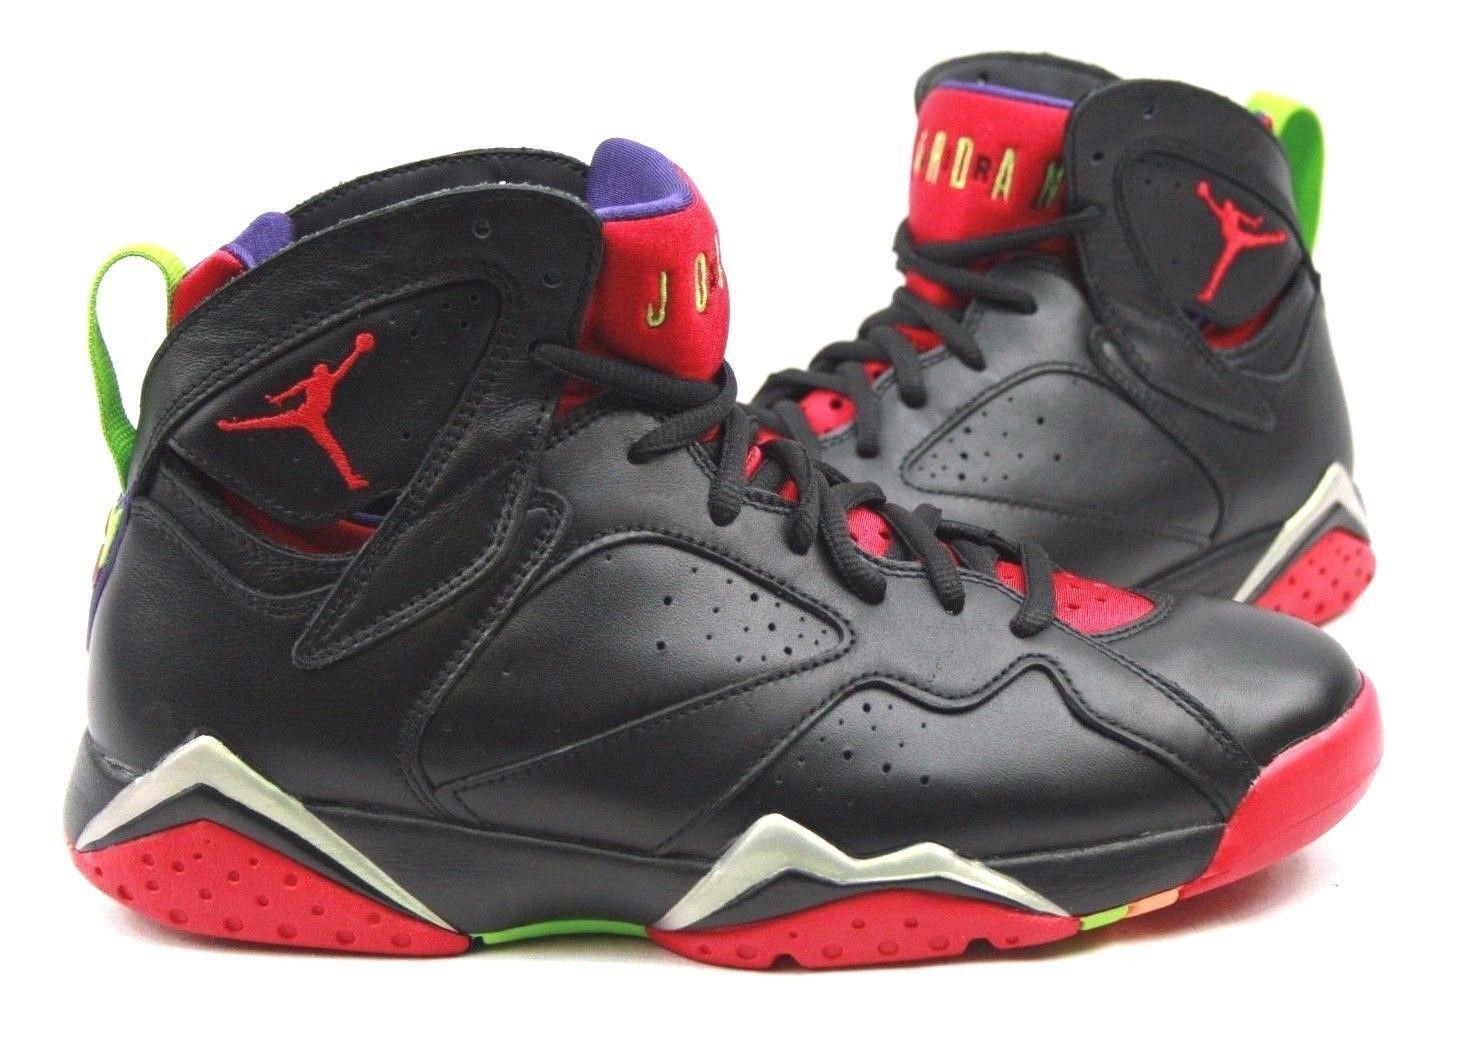 Nuevo Nike de Jordan 7 Retro Zapatos de Nike baloncesto Air Negro/Rojo/Verde 304775-029 a6e838